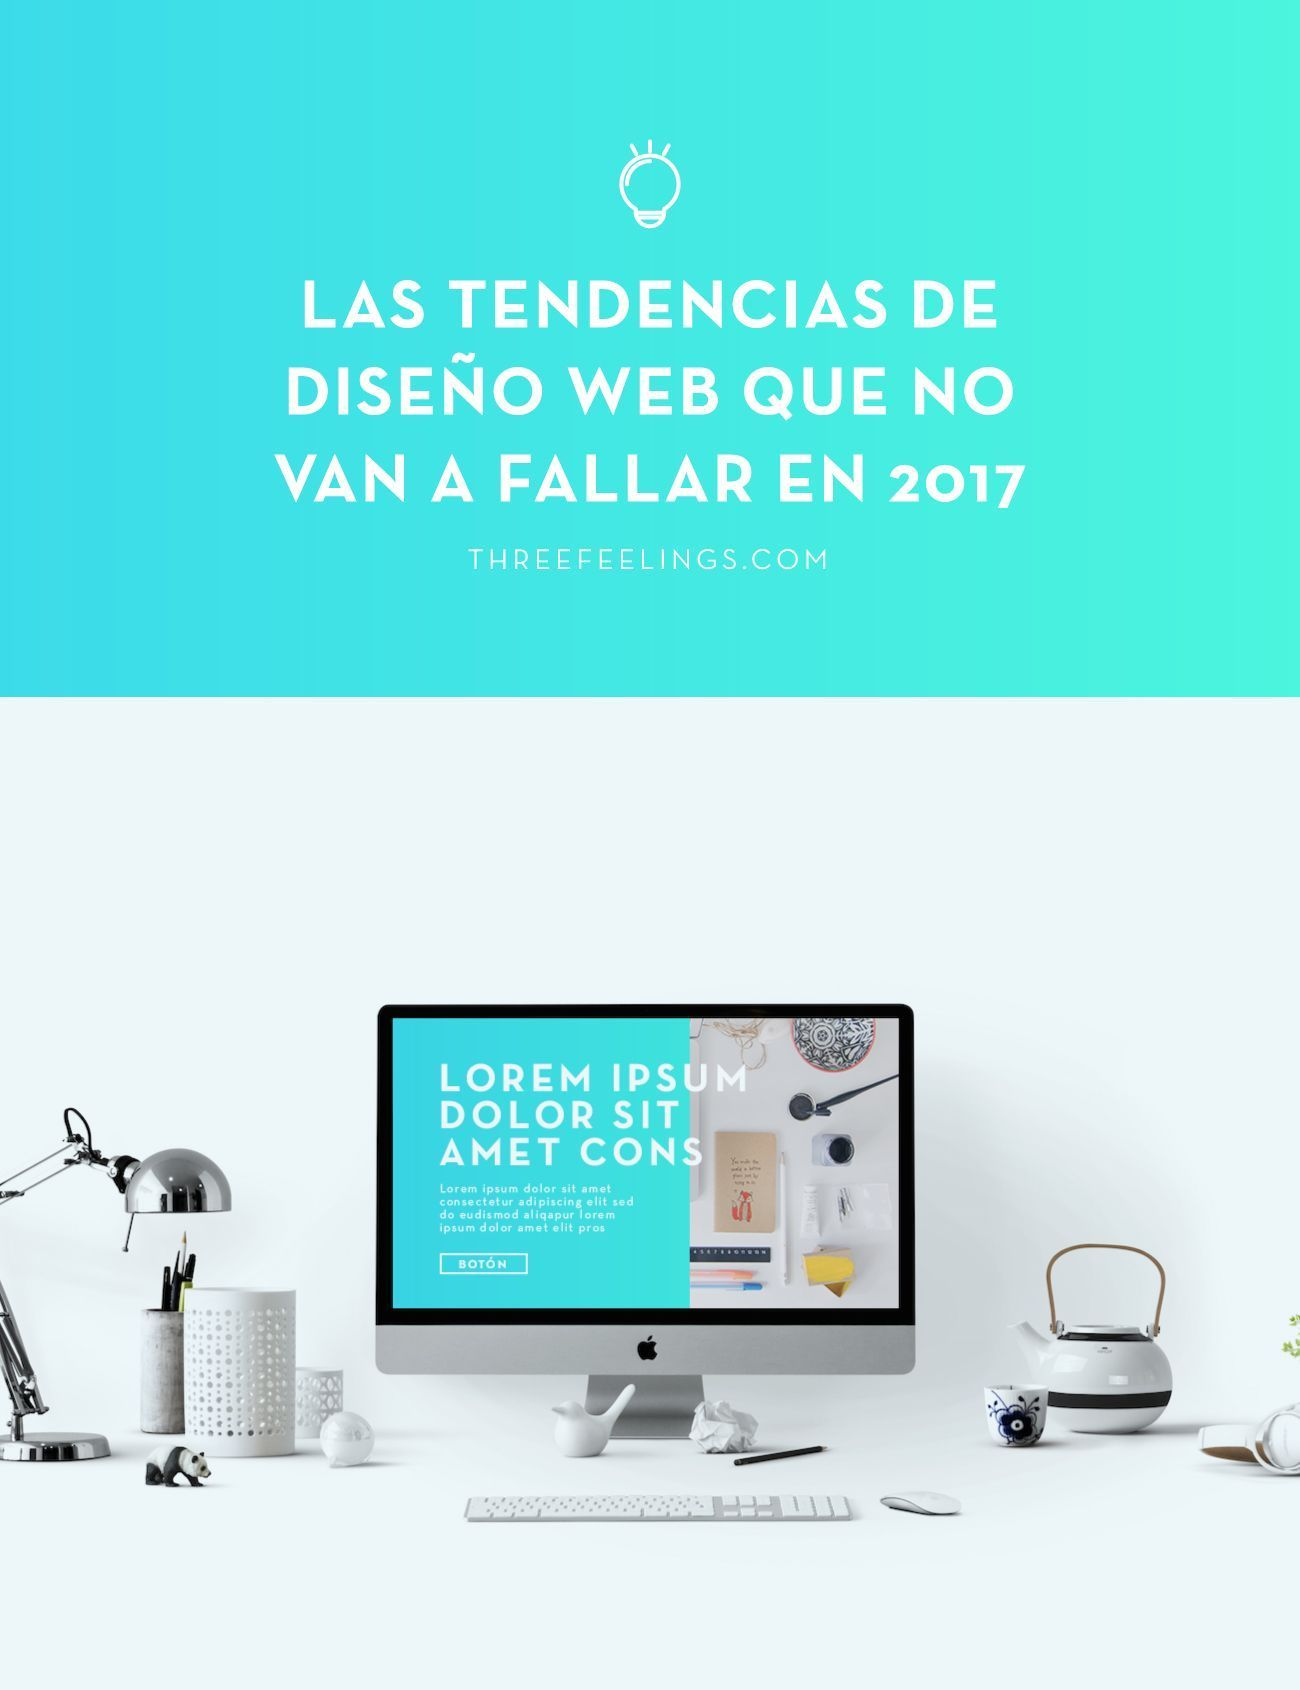 tendencias-diseno-web-2017-threefeelings-00